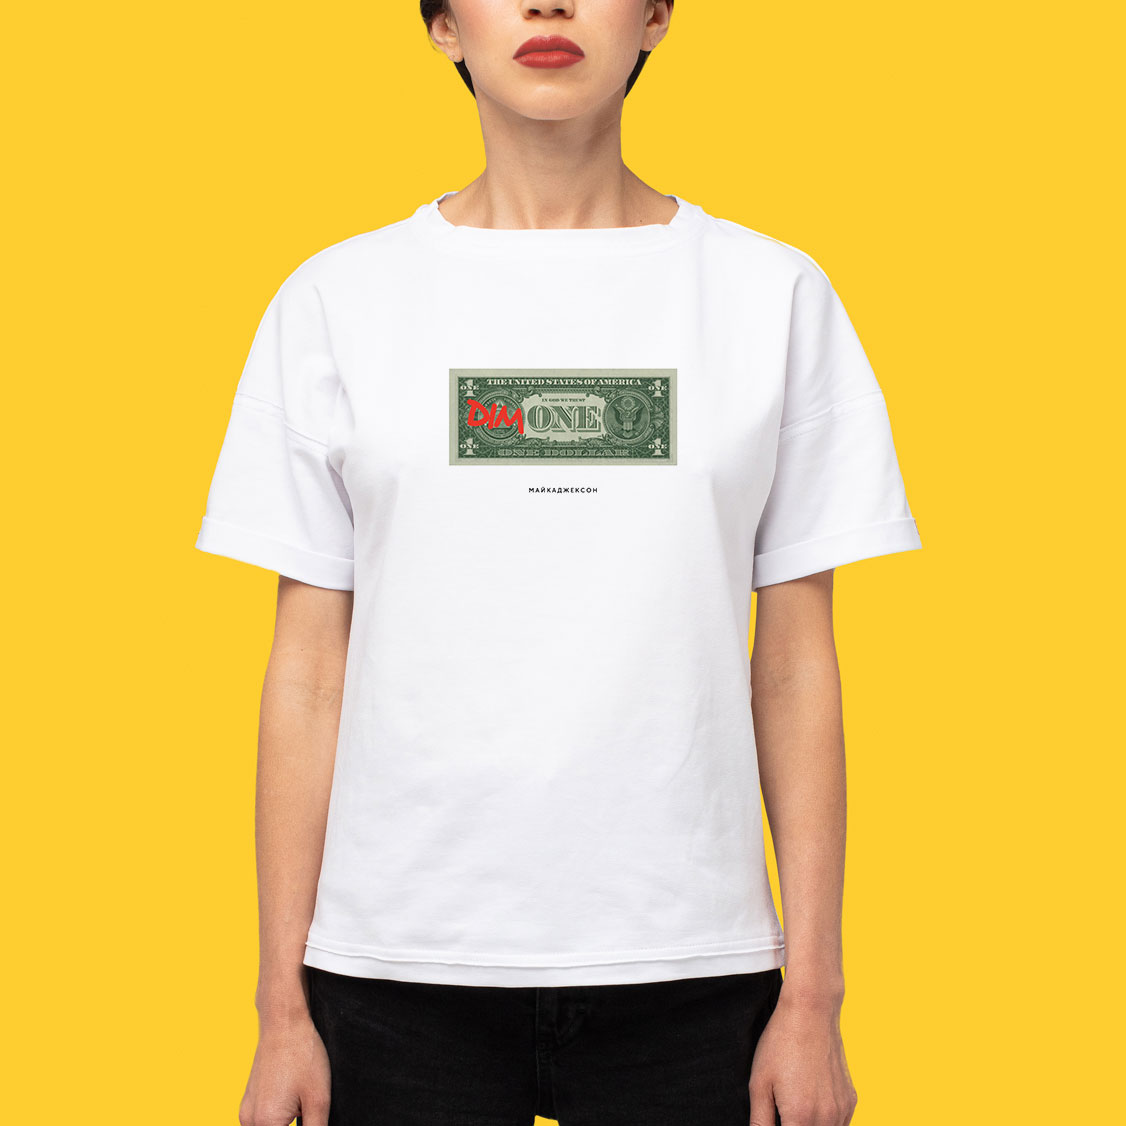 МАЙКАДЖЕКСОН - Dimone (финансовая футболка Дмитрия)